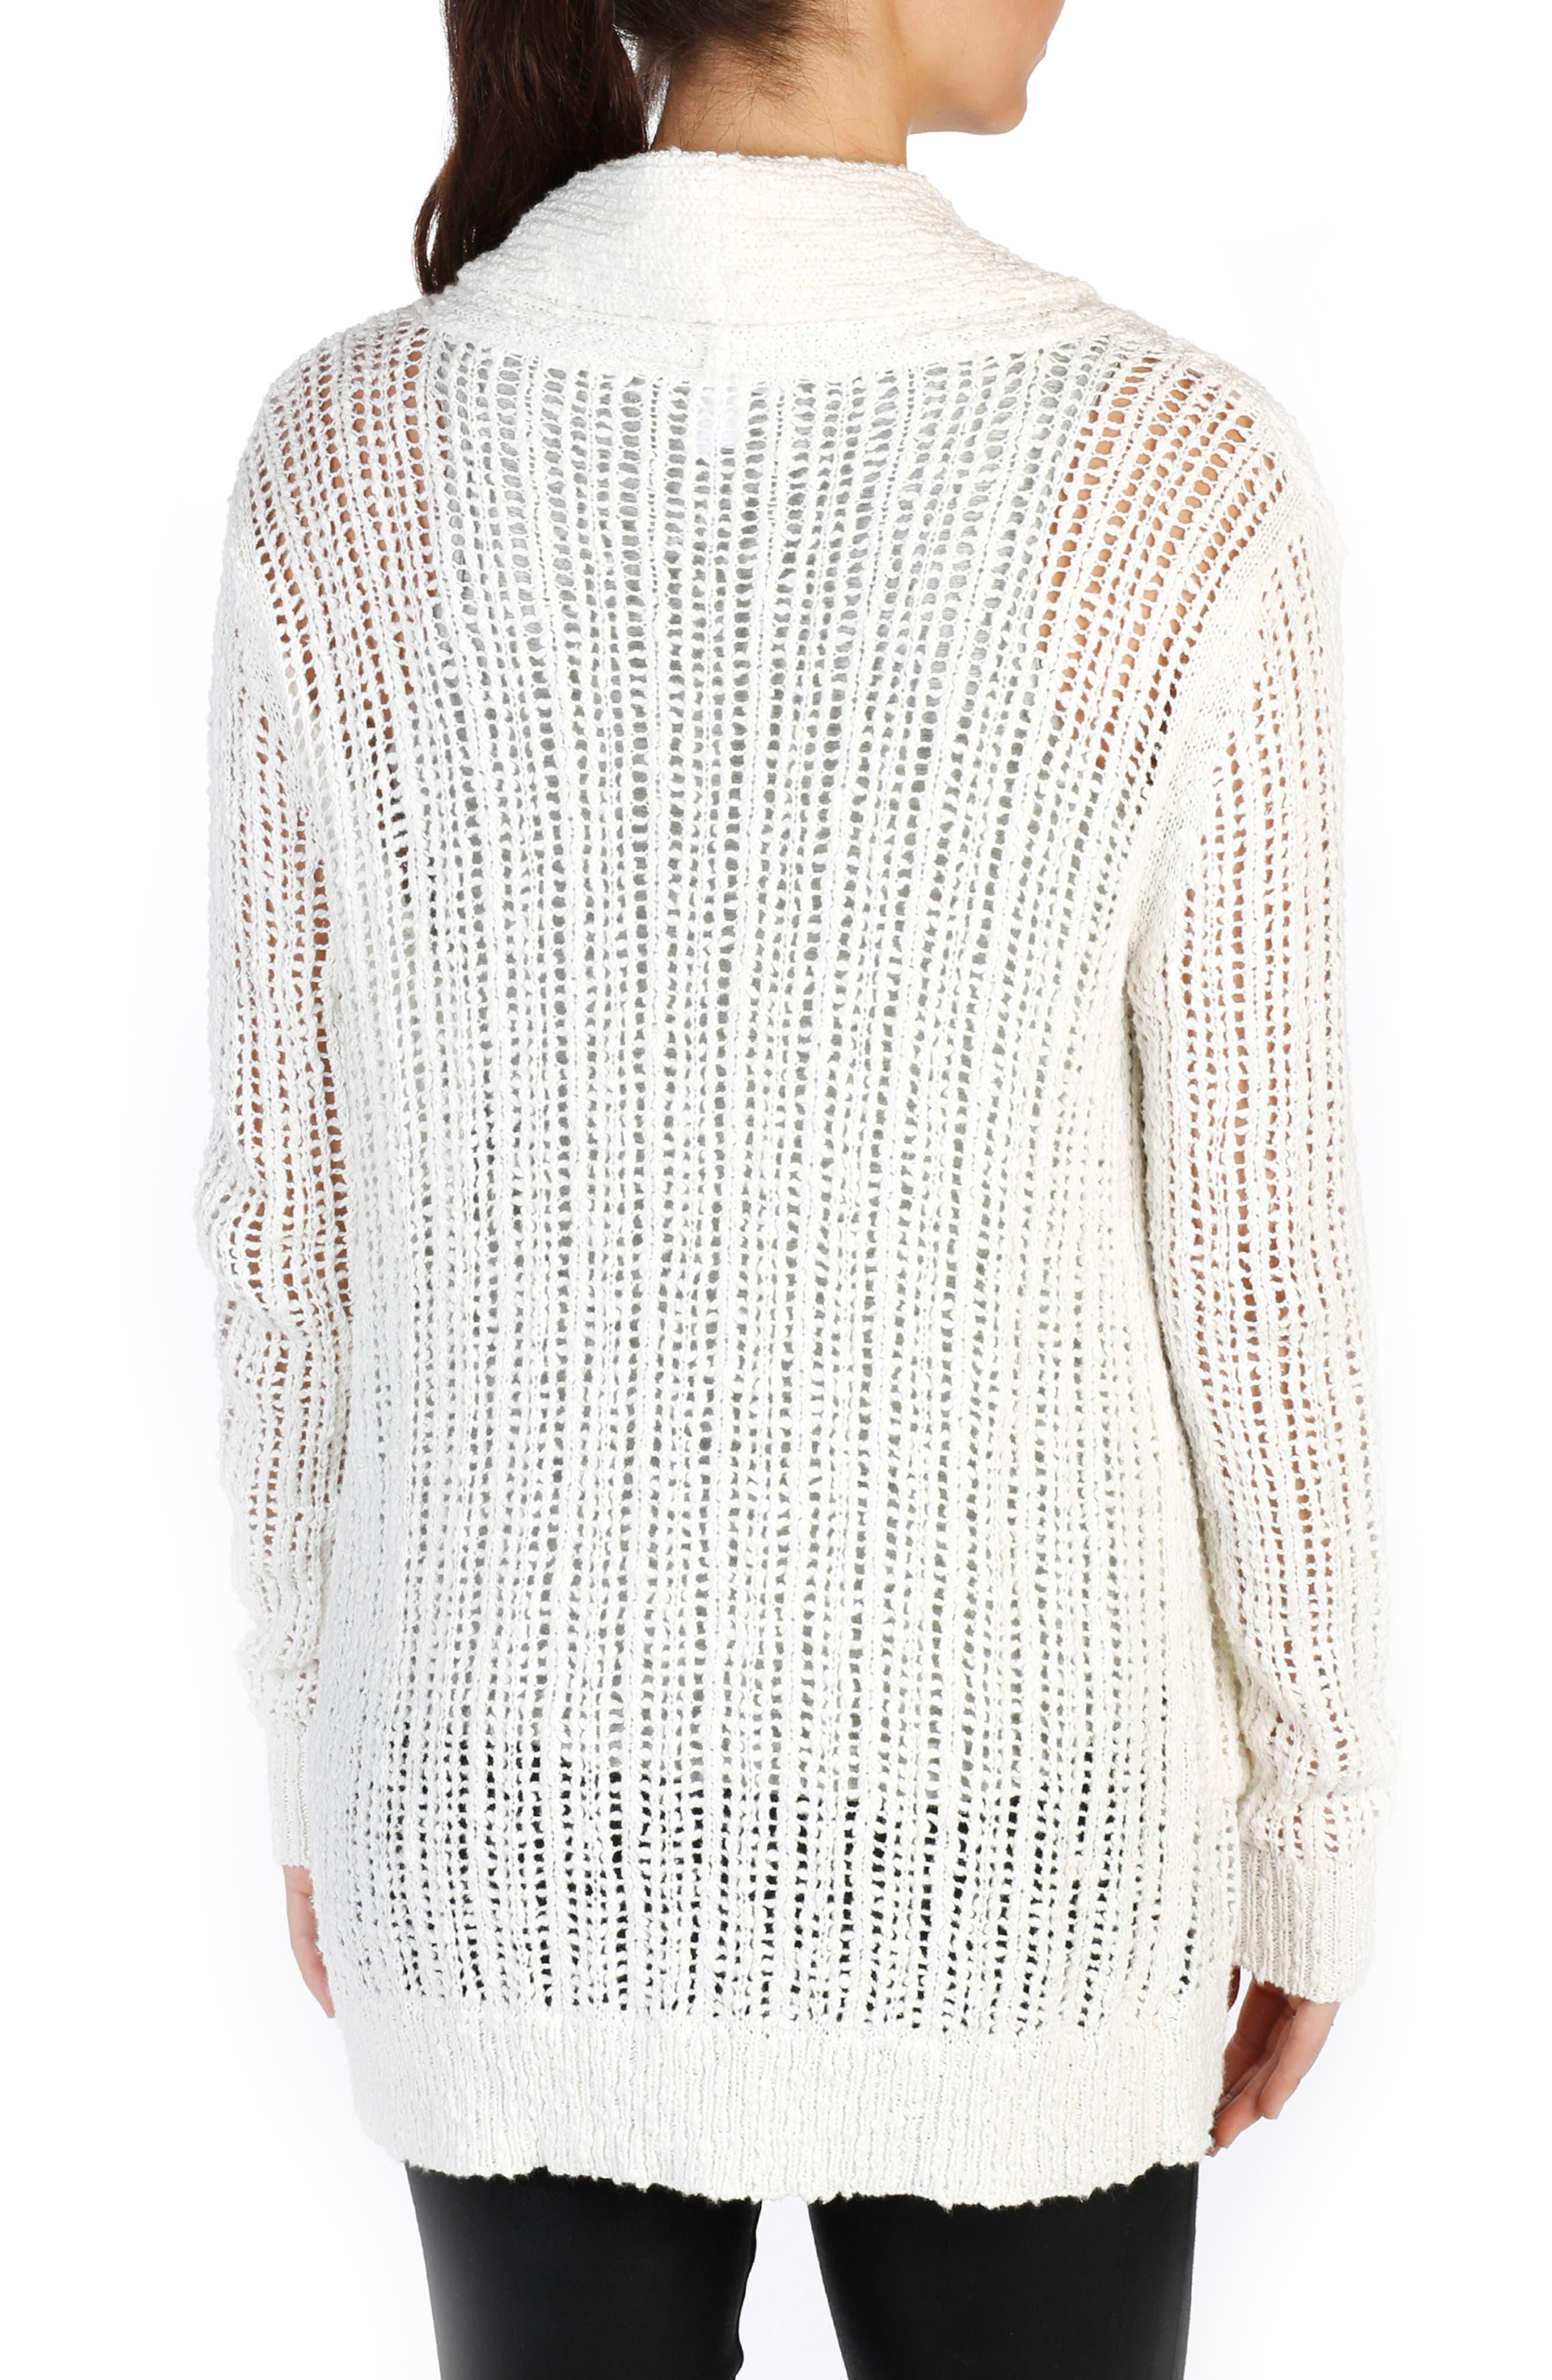 Aimee Cotton Cardigan,                             Alternate thumbnail 2, color,                             900